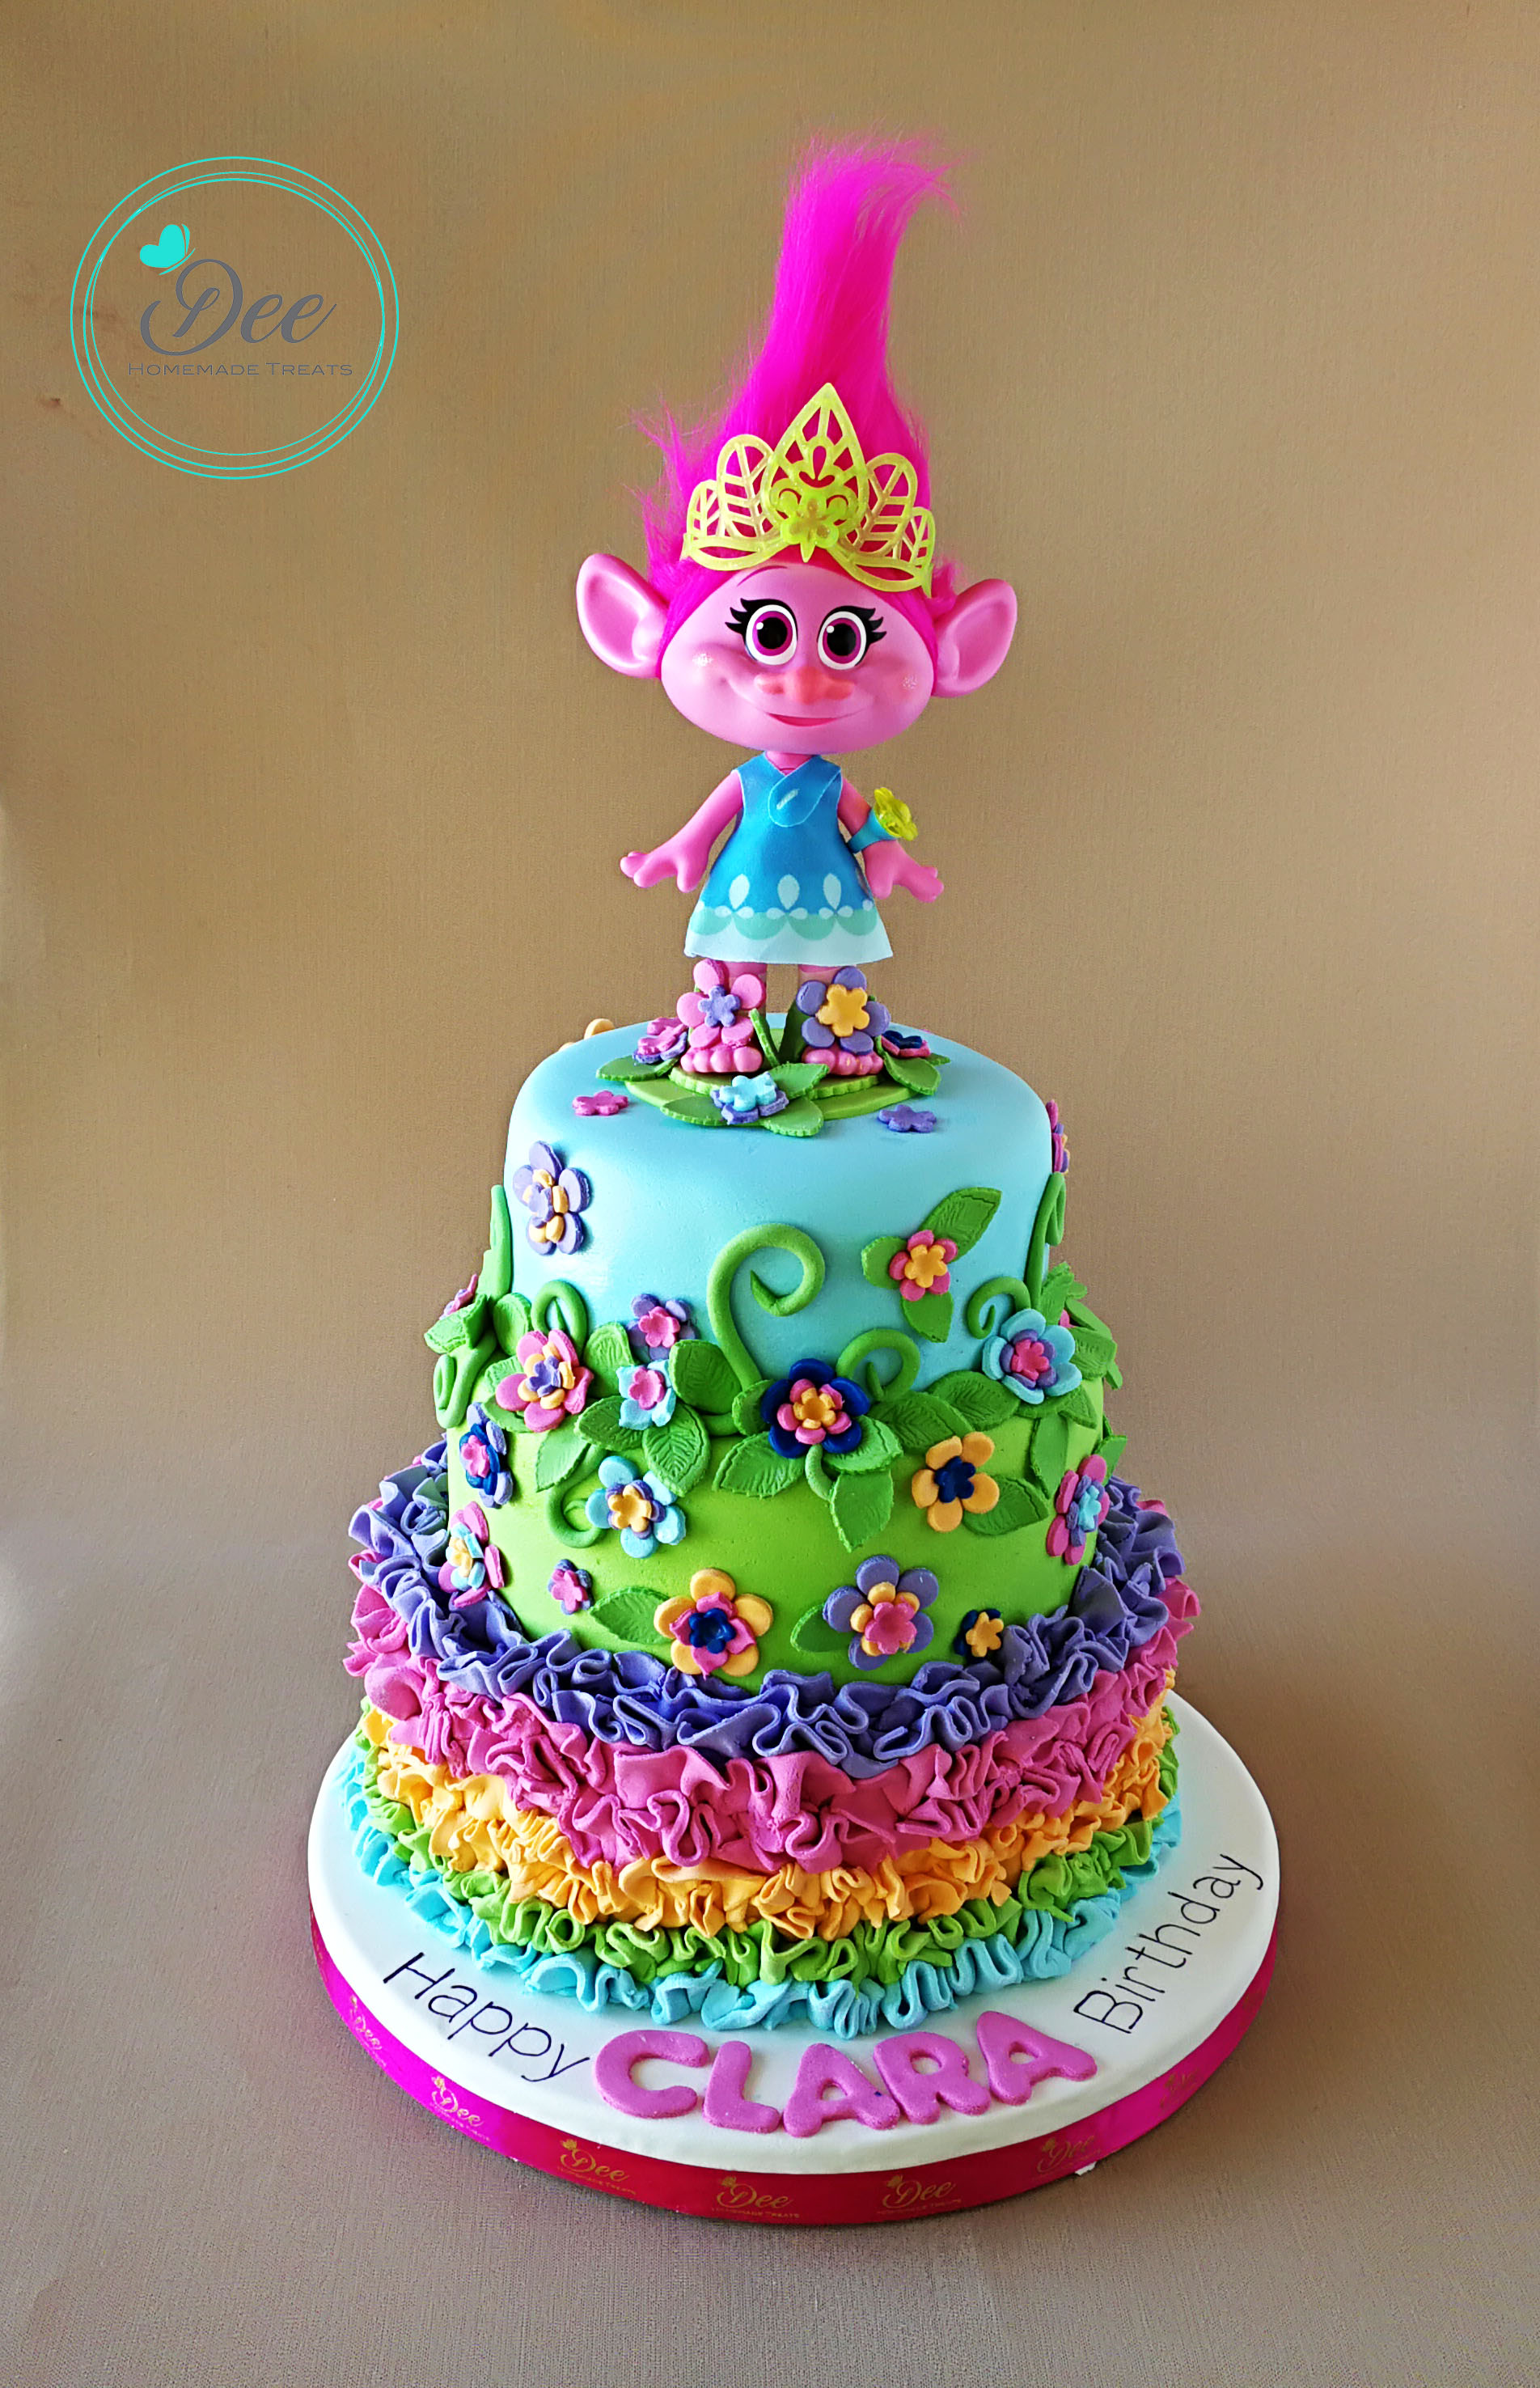 Dee Lebanon Cake Cakes In